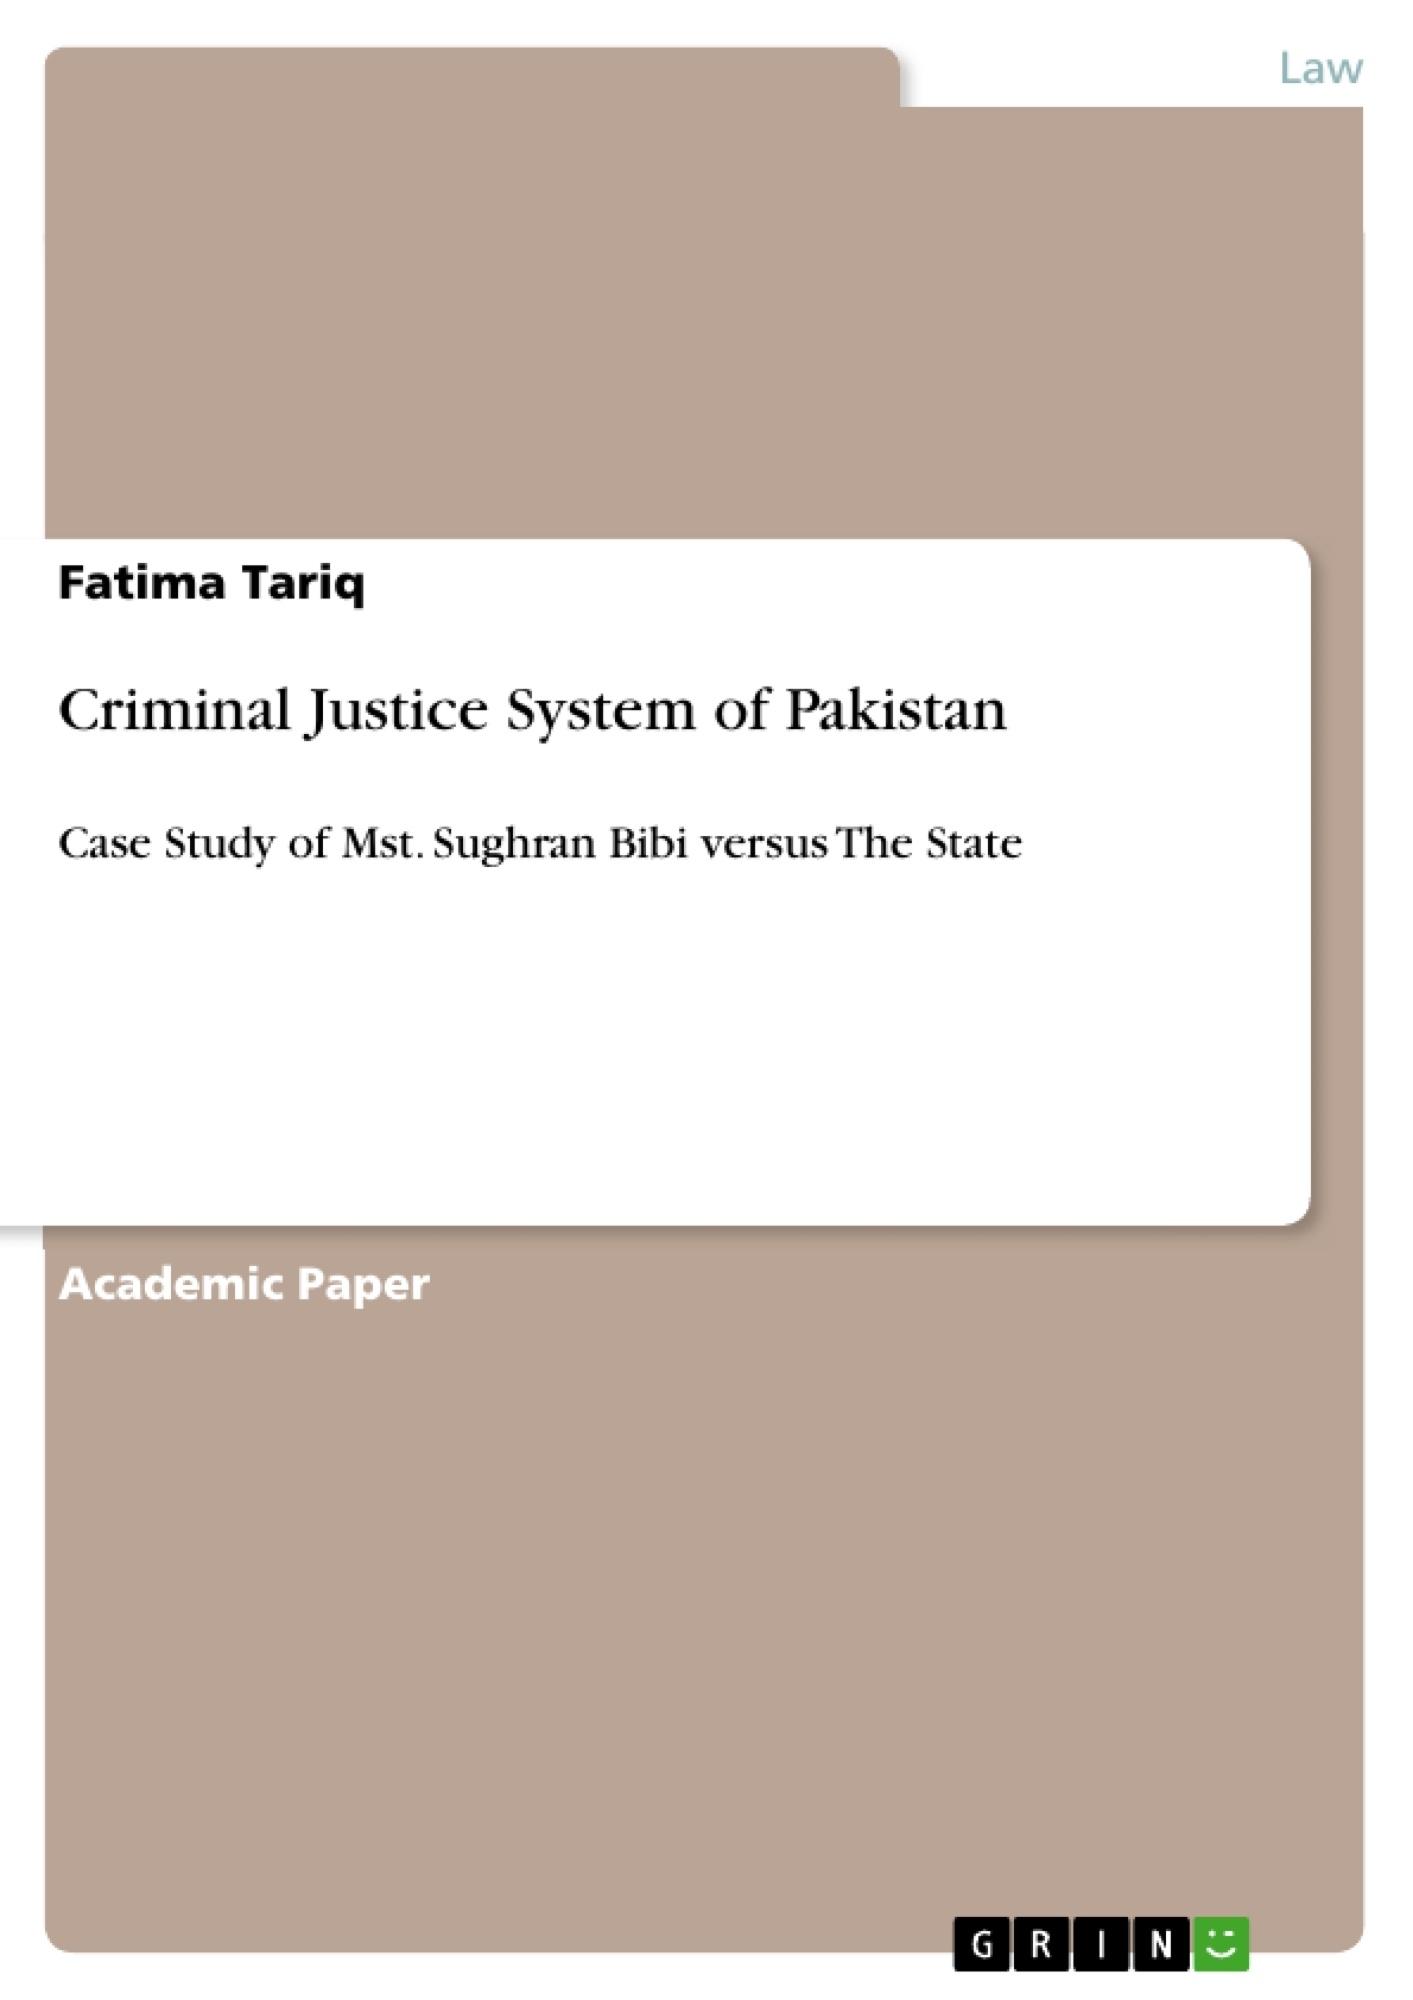 Title: Criminal Justice System of Pakistan